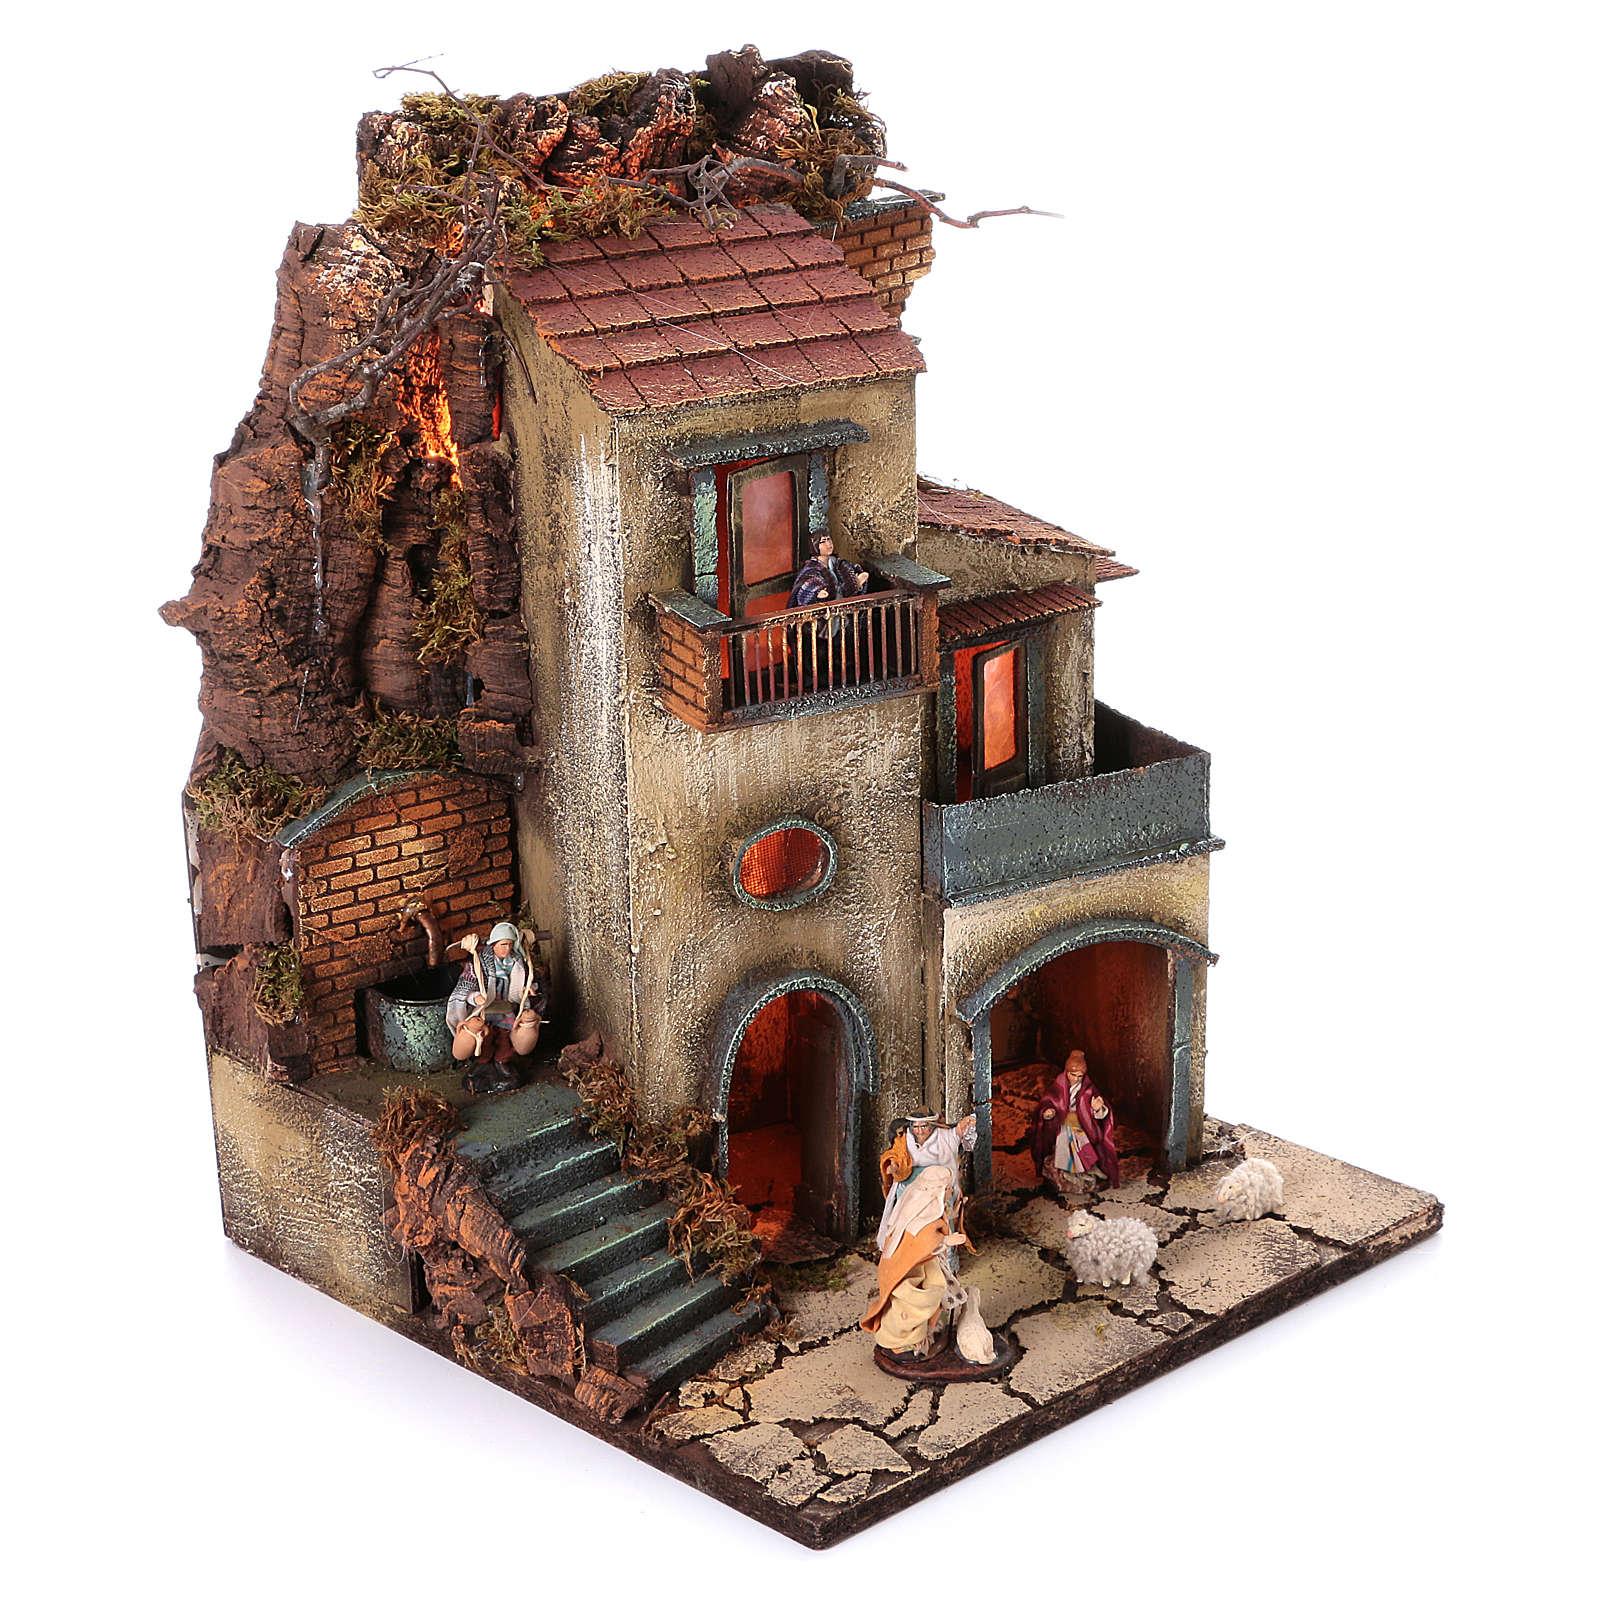 Borgo presepe napoletano 55x40x40 cm modulo 1 4